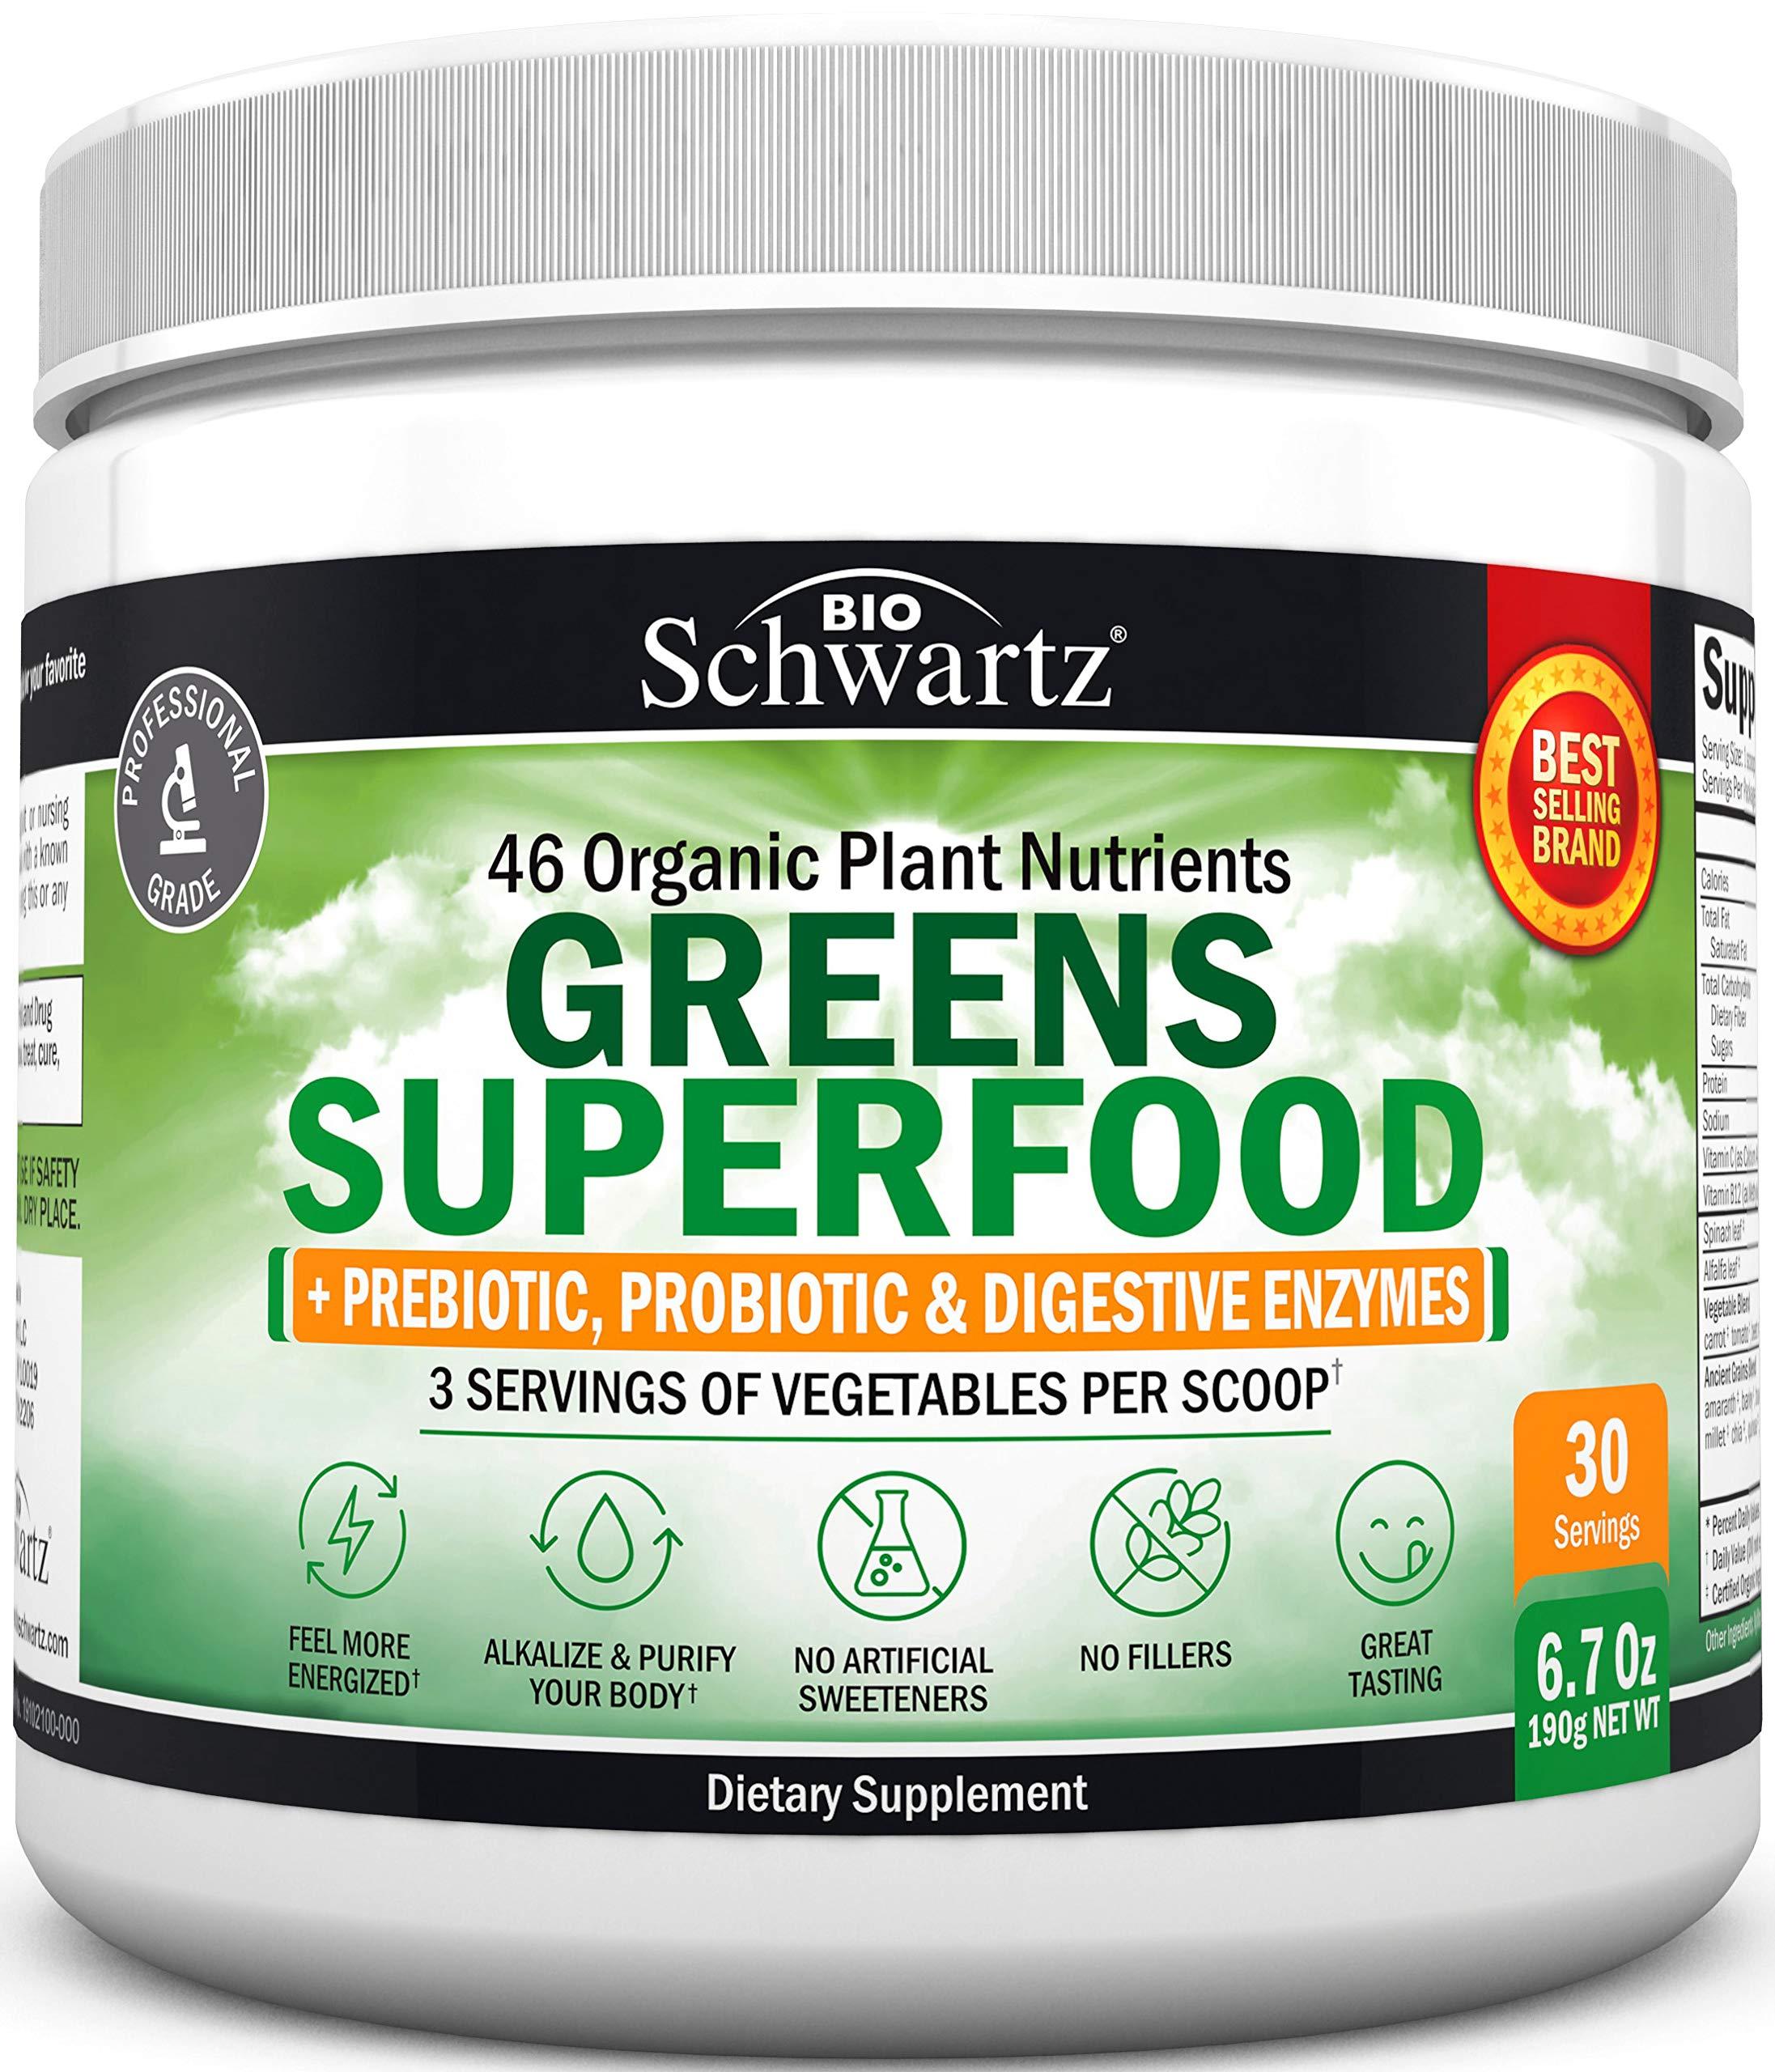 Super Greens Powder - 3 Servings of Veggies per Scoop   45+ Organic Green Superfoods (Alfalfa, Chlorella, Spirulina & More) + Digestive Enzymes - Keto Friendly Vegan Supplement